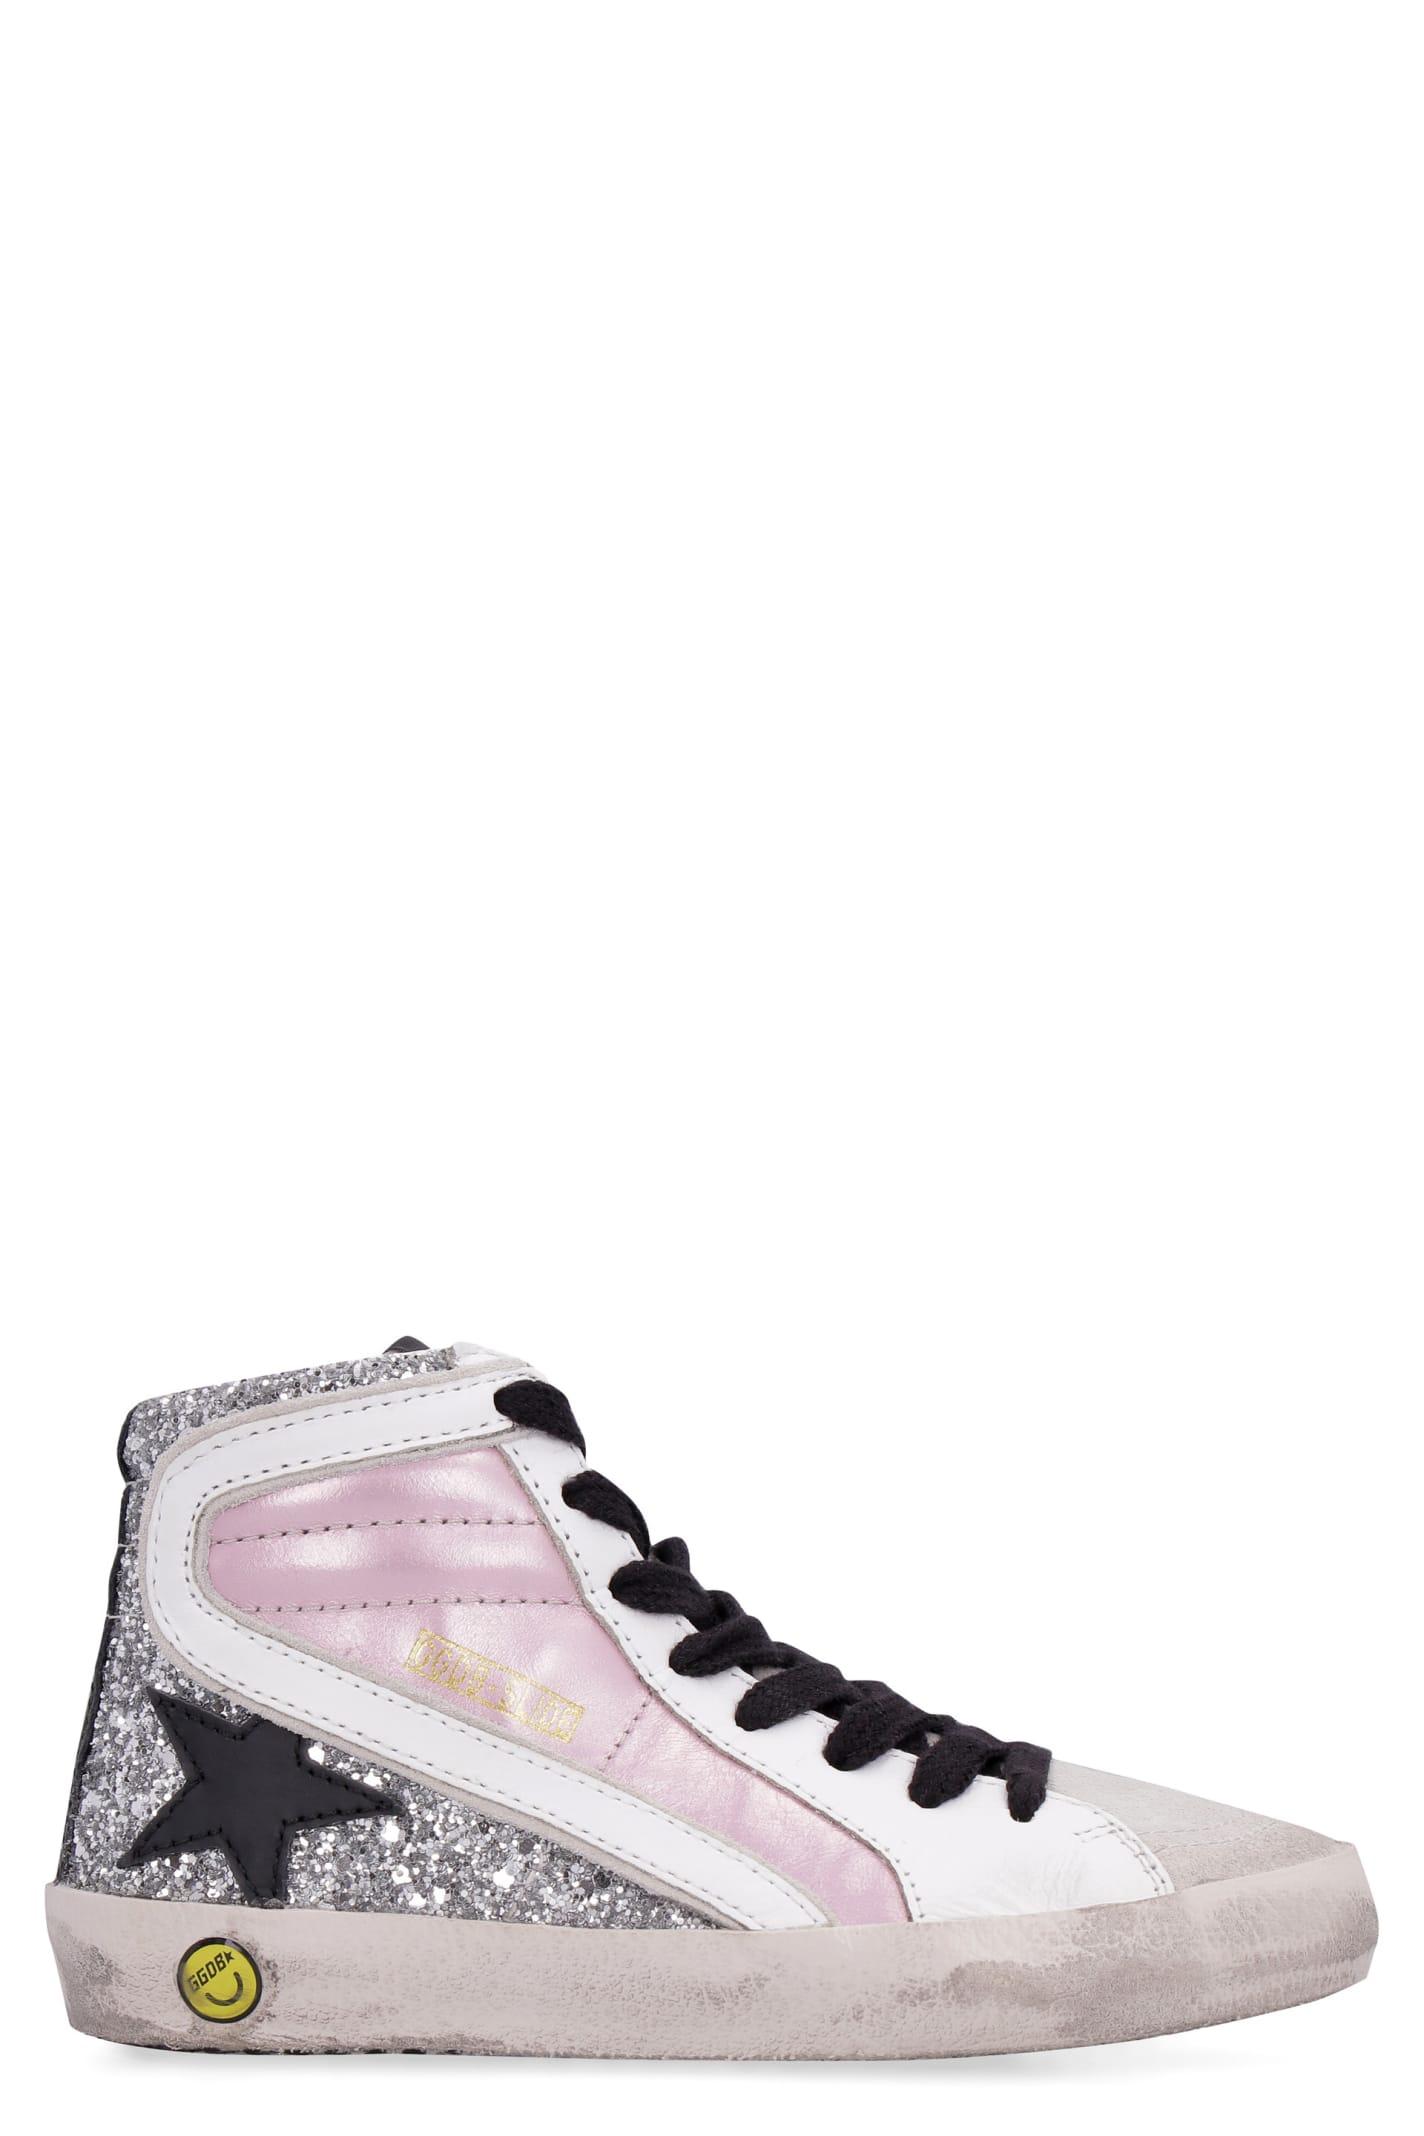 Golden Goose Slide Glitter Details High-top Sneakers